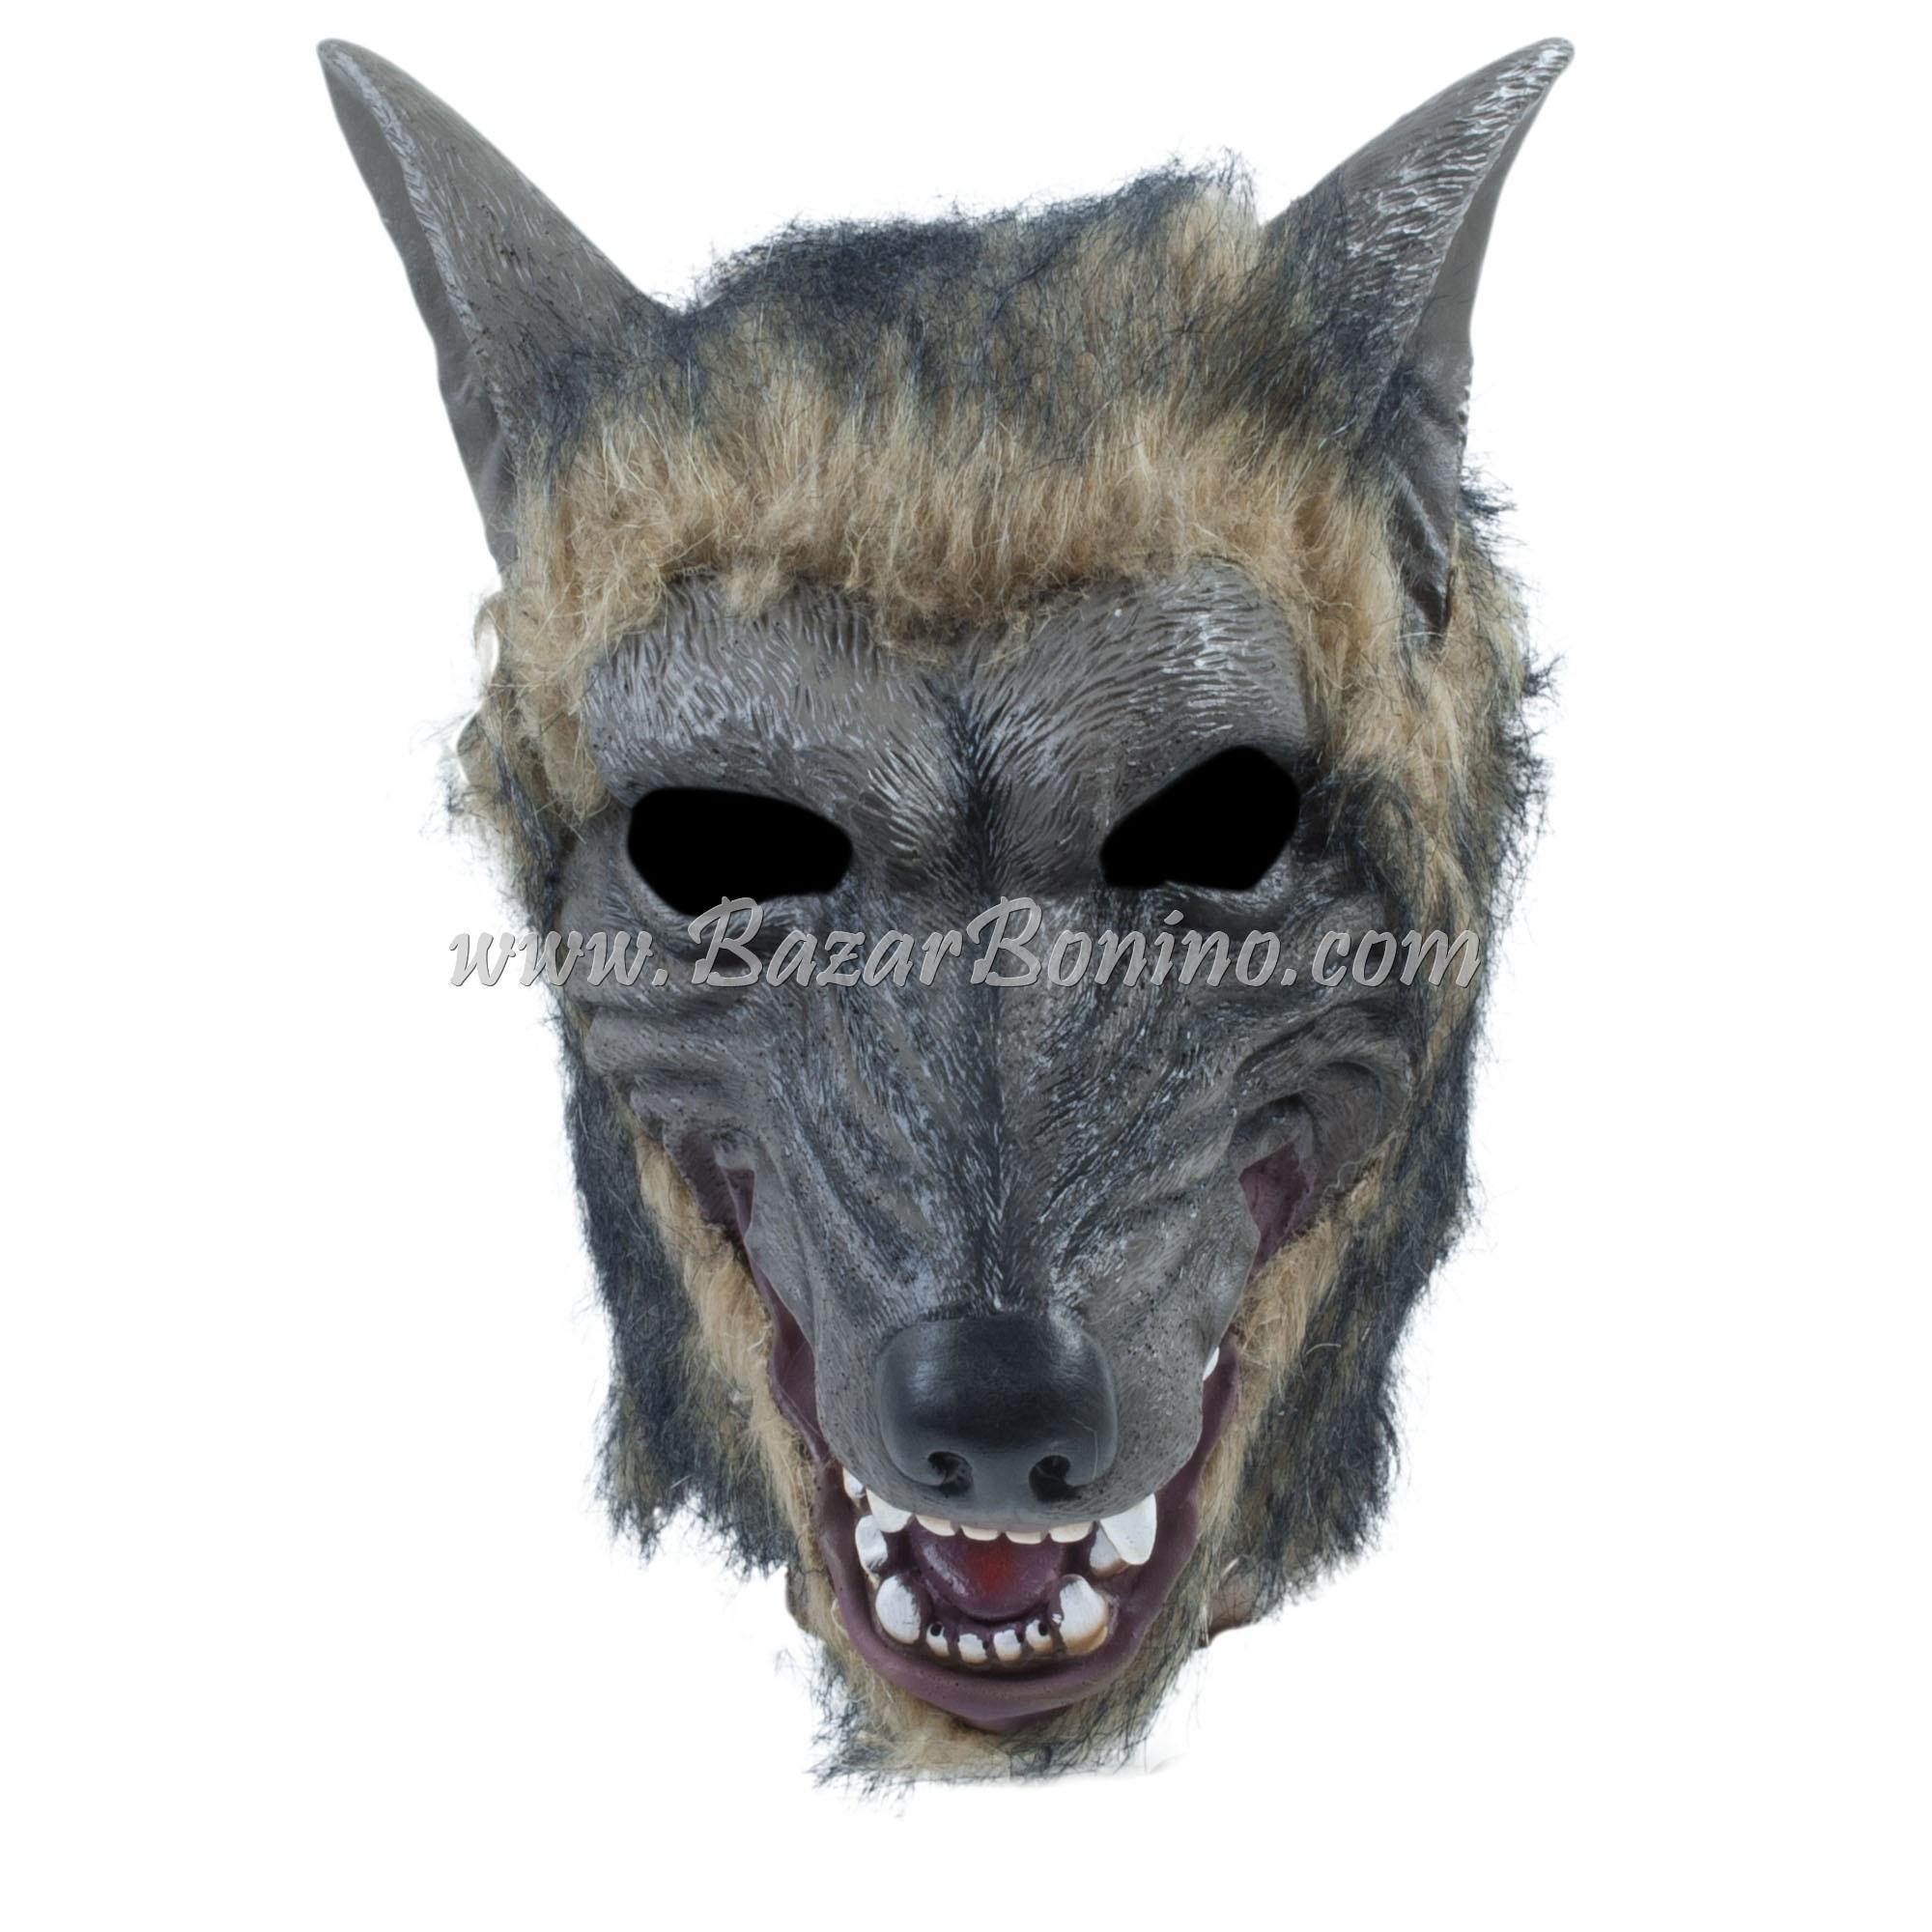 BM0539 - Maschera Lupo Lattice